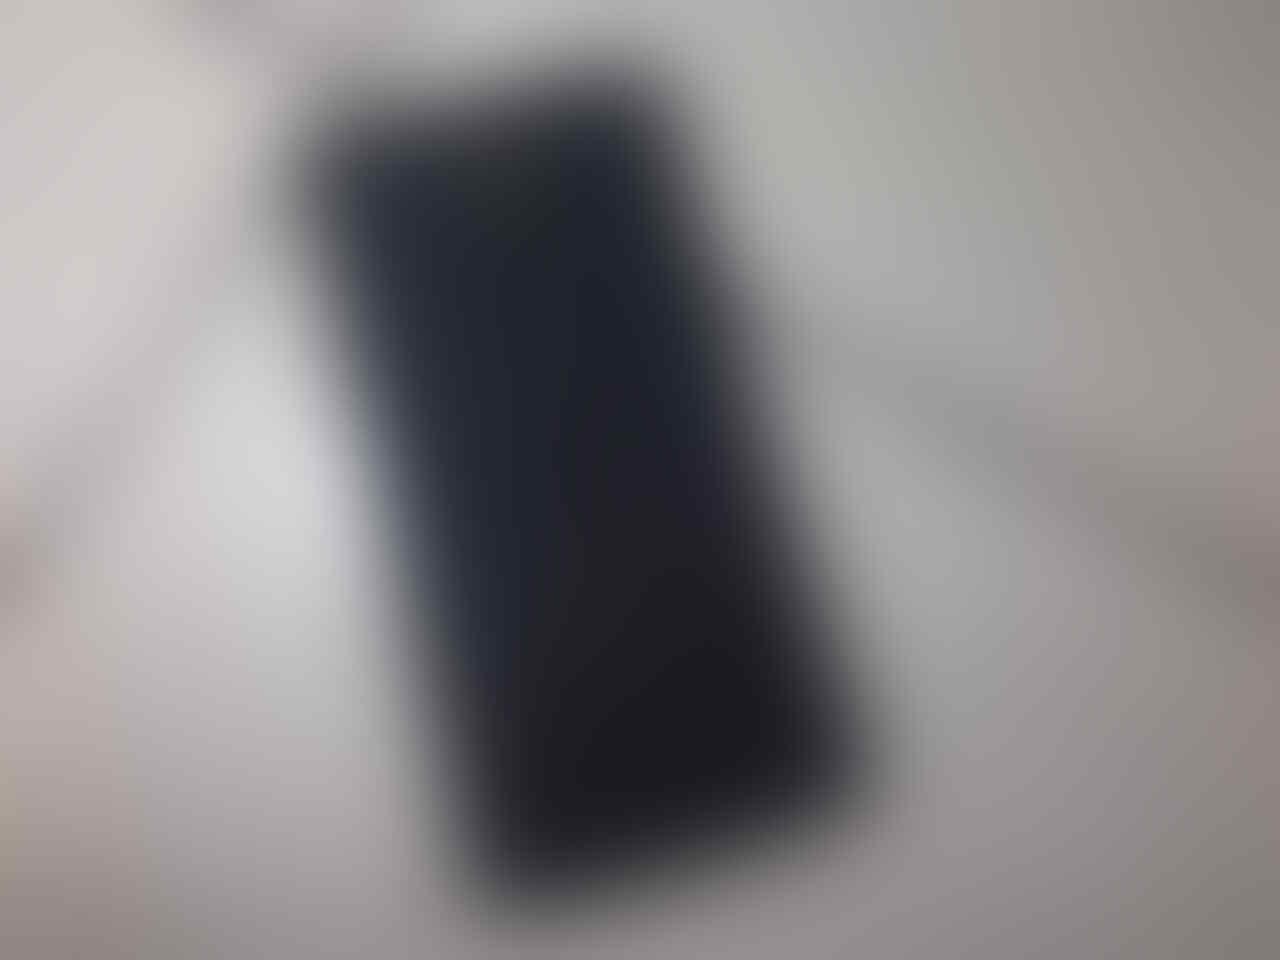 OnePlus One 64GB Sandstone Black